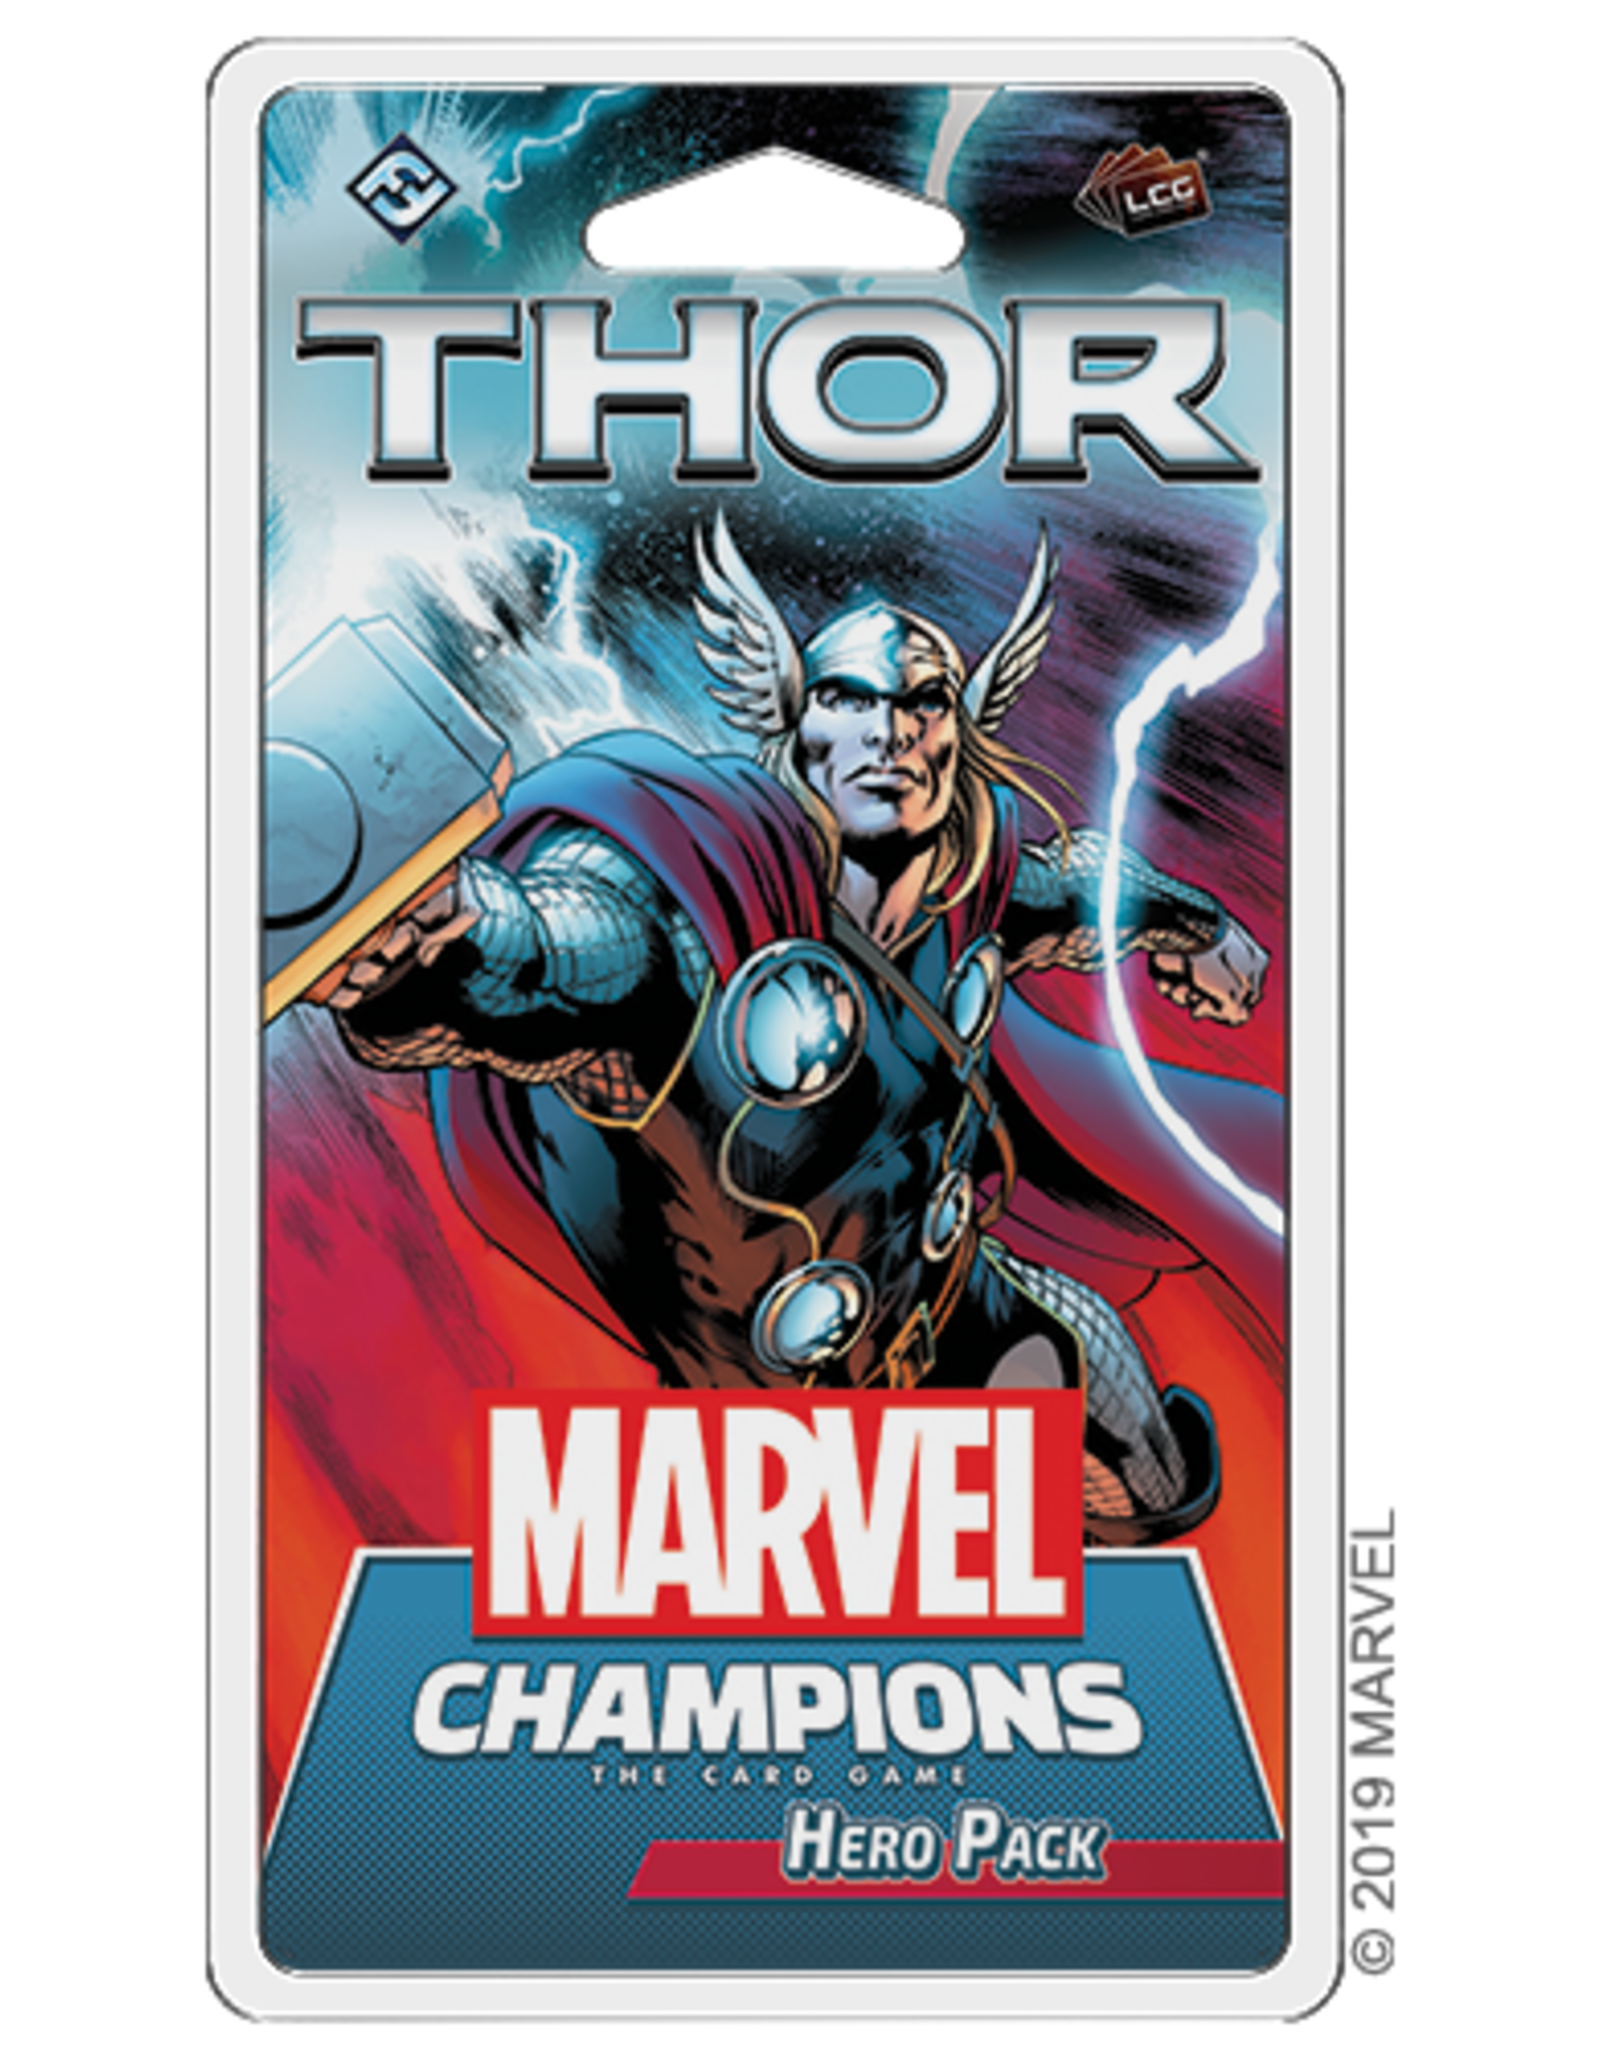 FFG Marvel Champions LCG: Thor Hero Pack